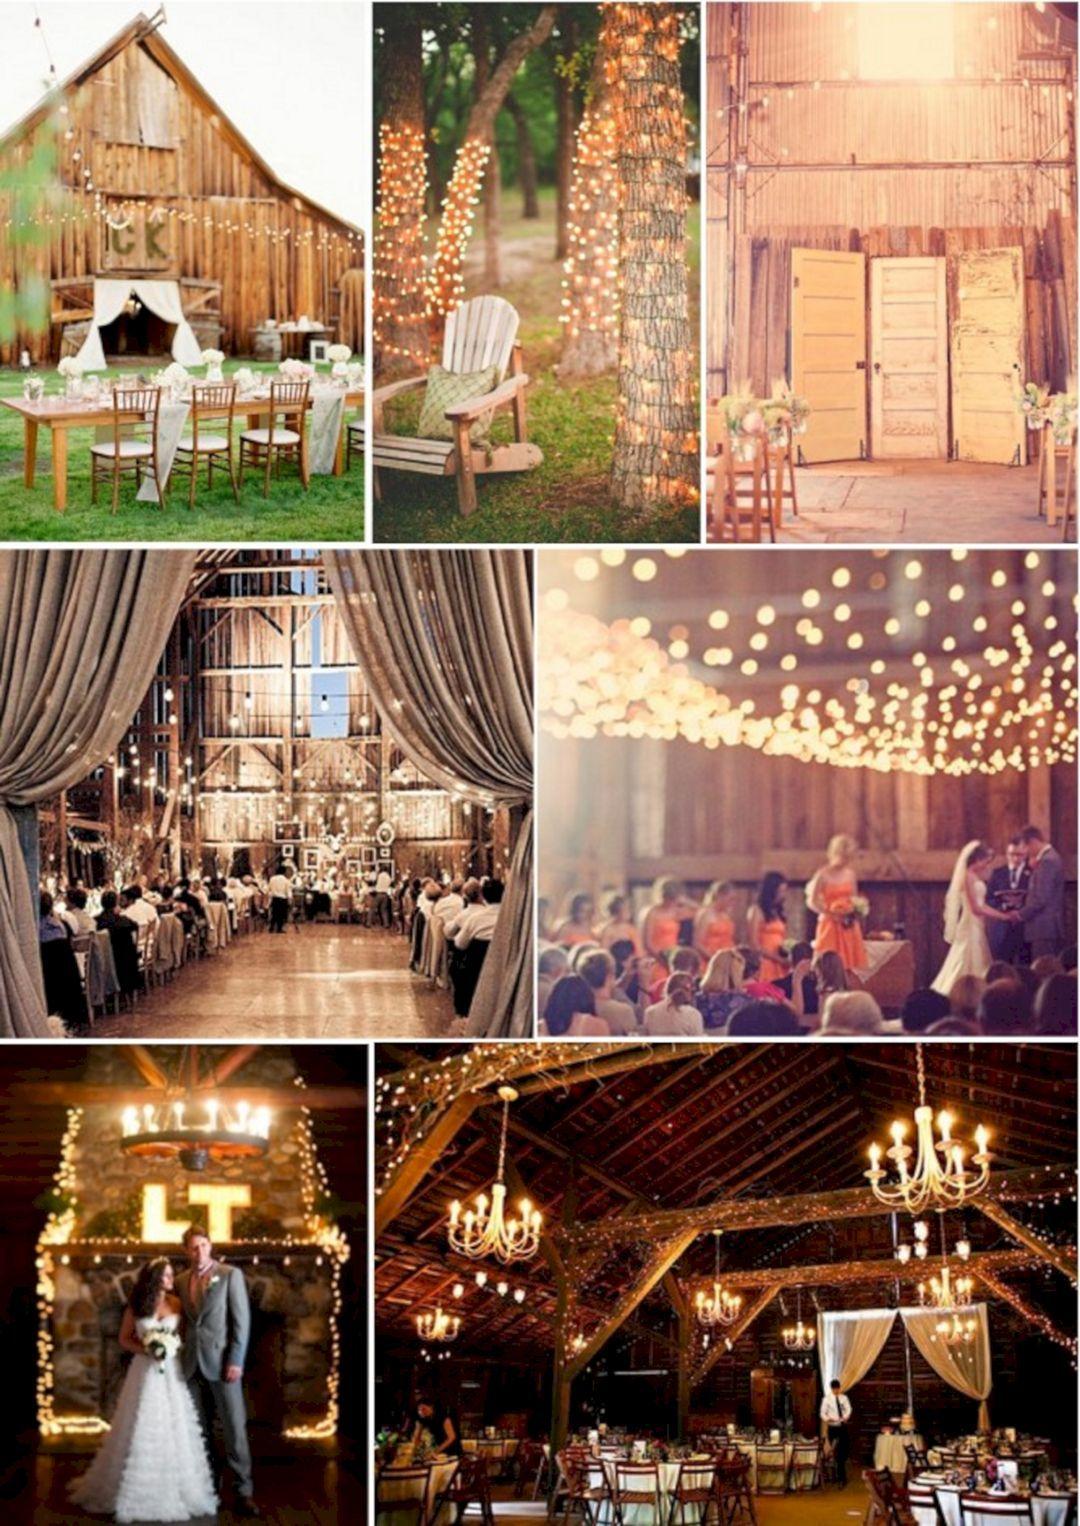 Wedding reception decoration ideas with lights   Incredible Wedding Lighting Decoration Ideas On a Budget